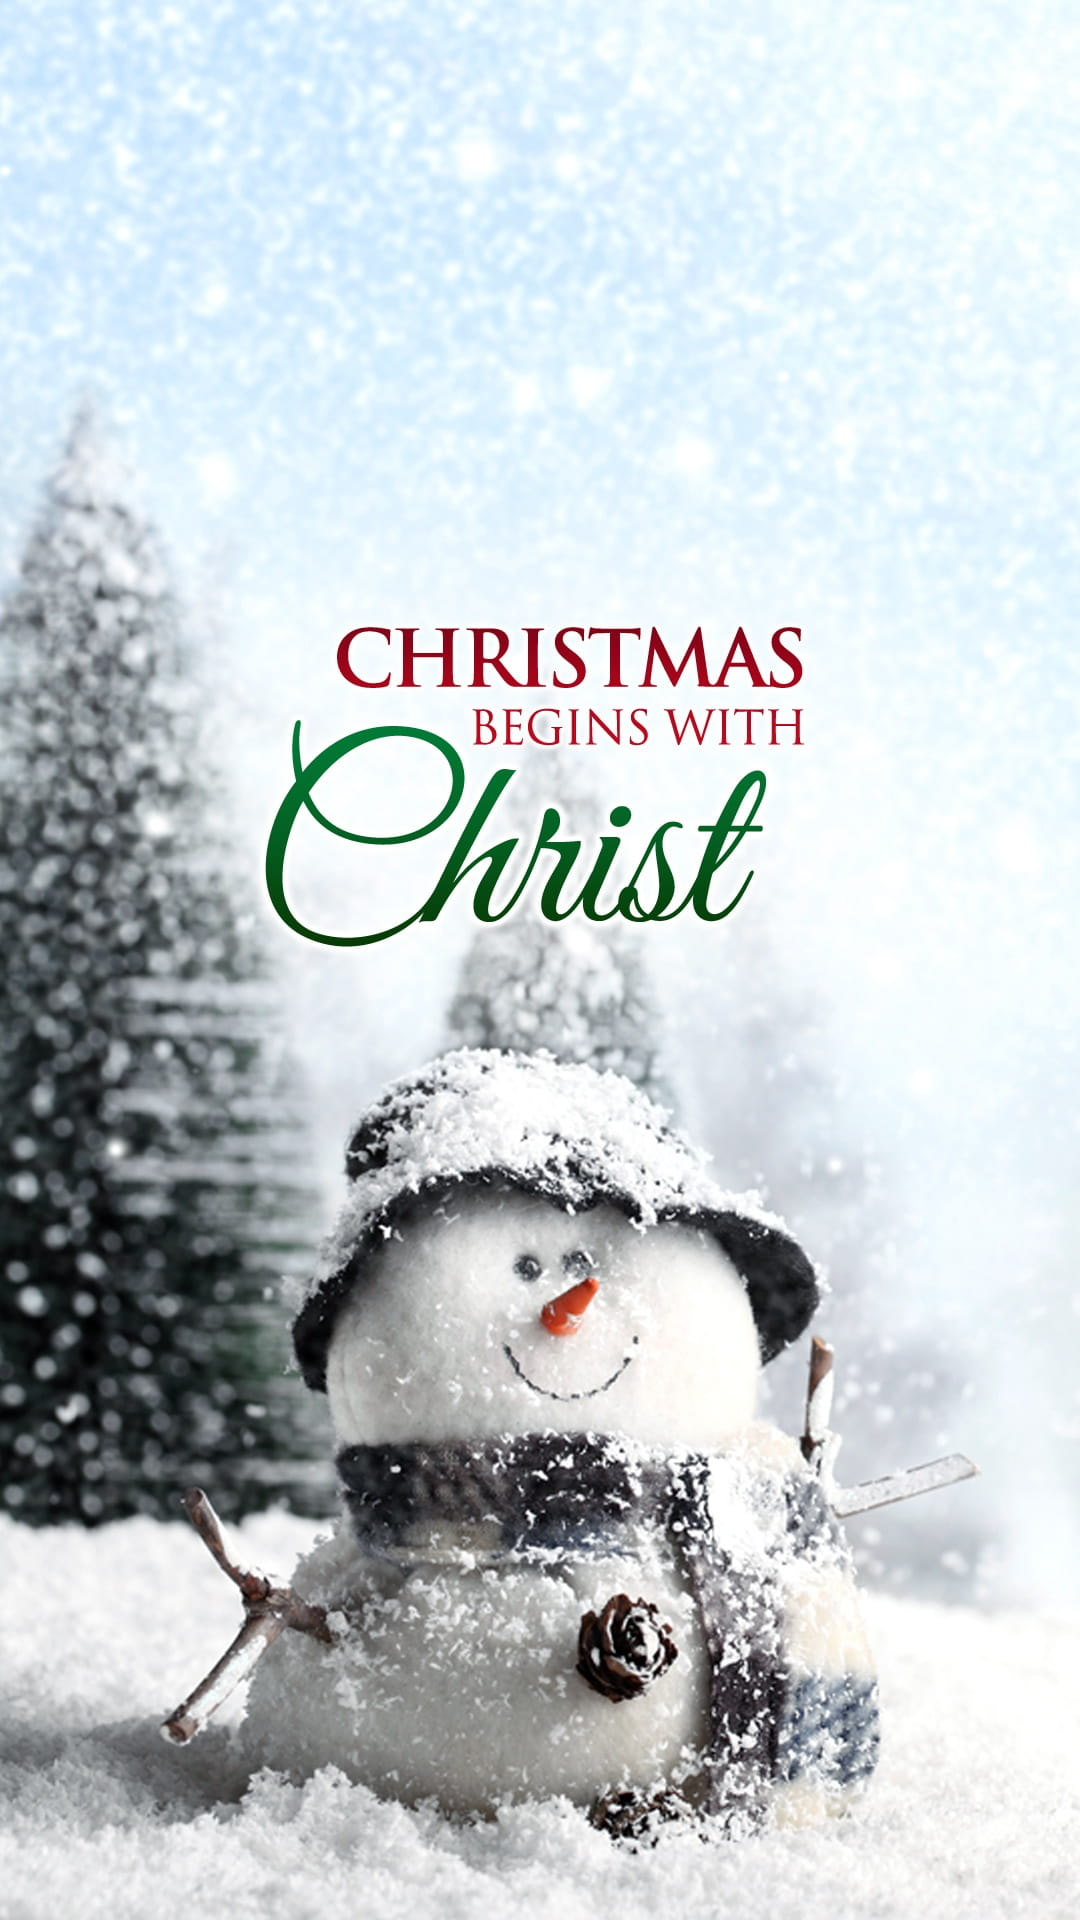 Christian Wallpaper Iphone 6 December 2015 Christmas Begins With Christ Desktop